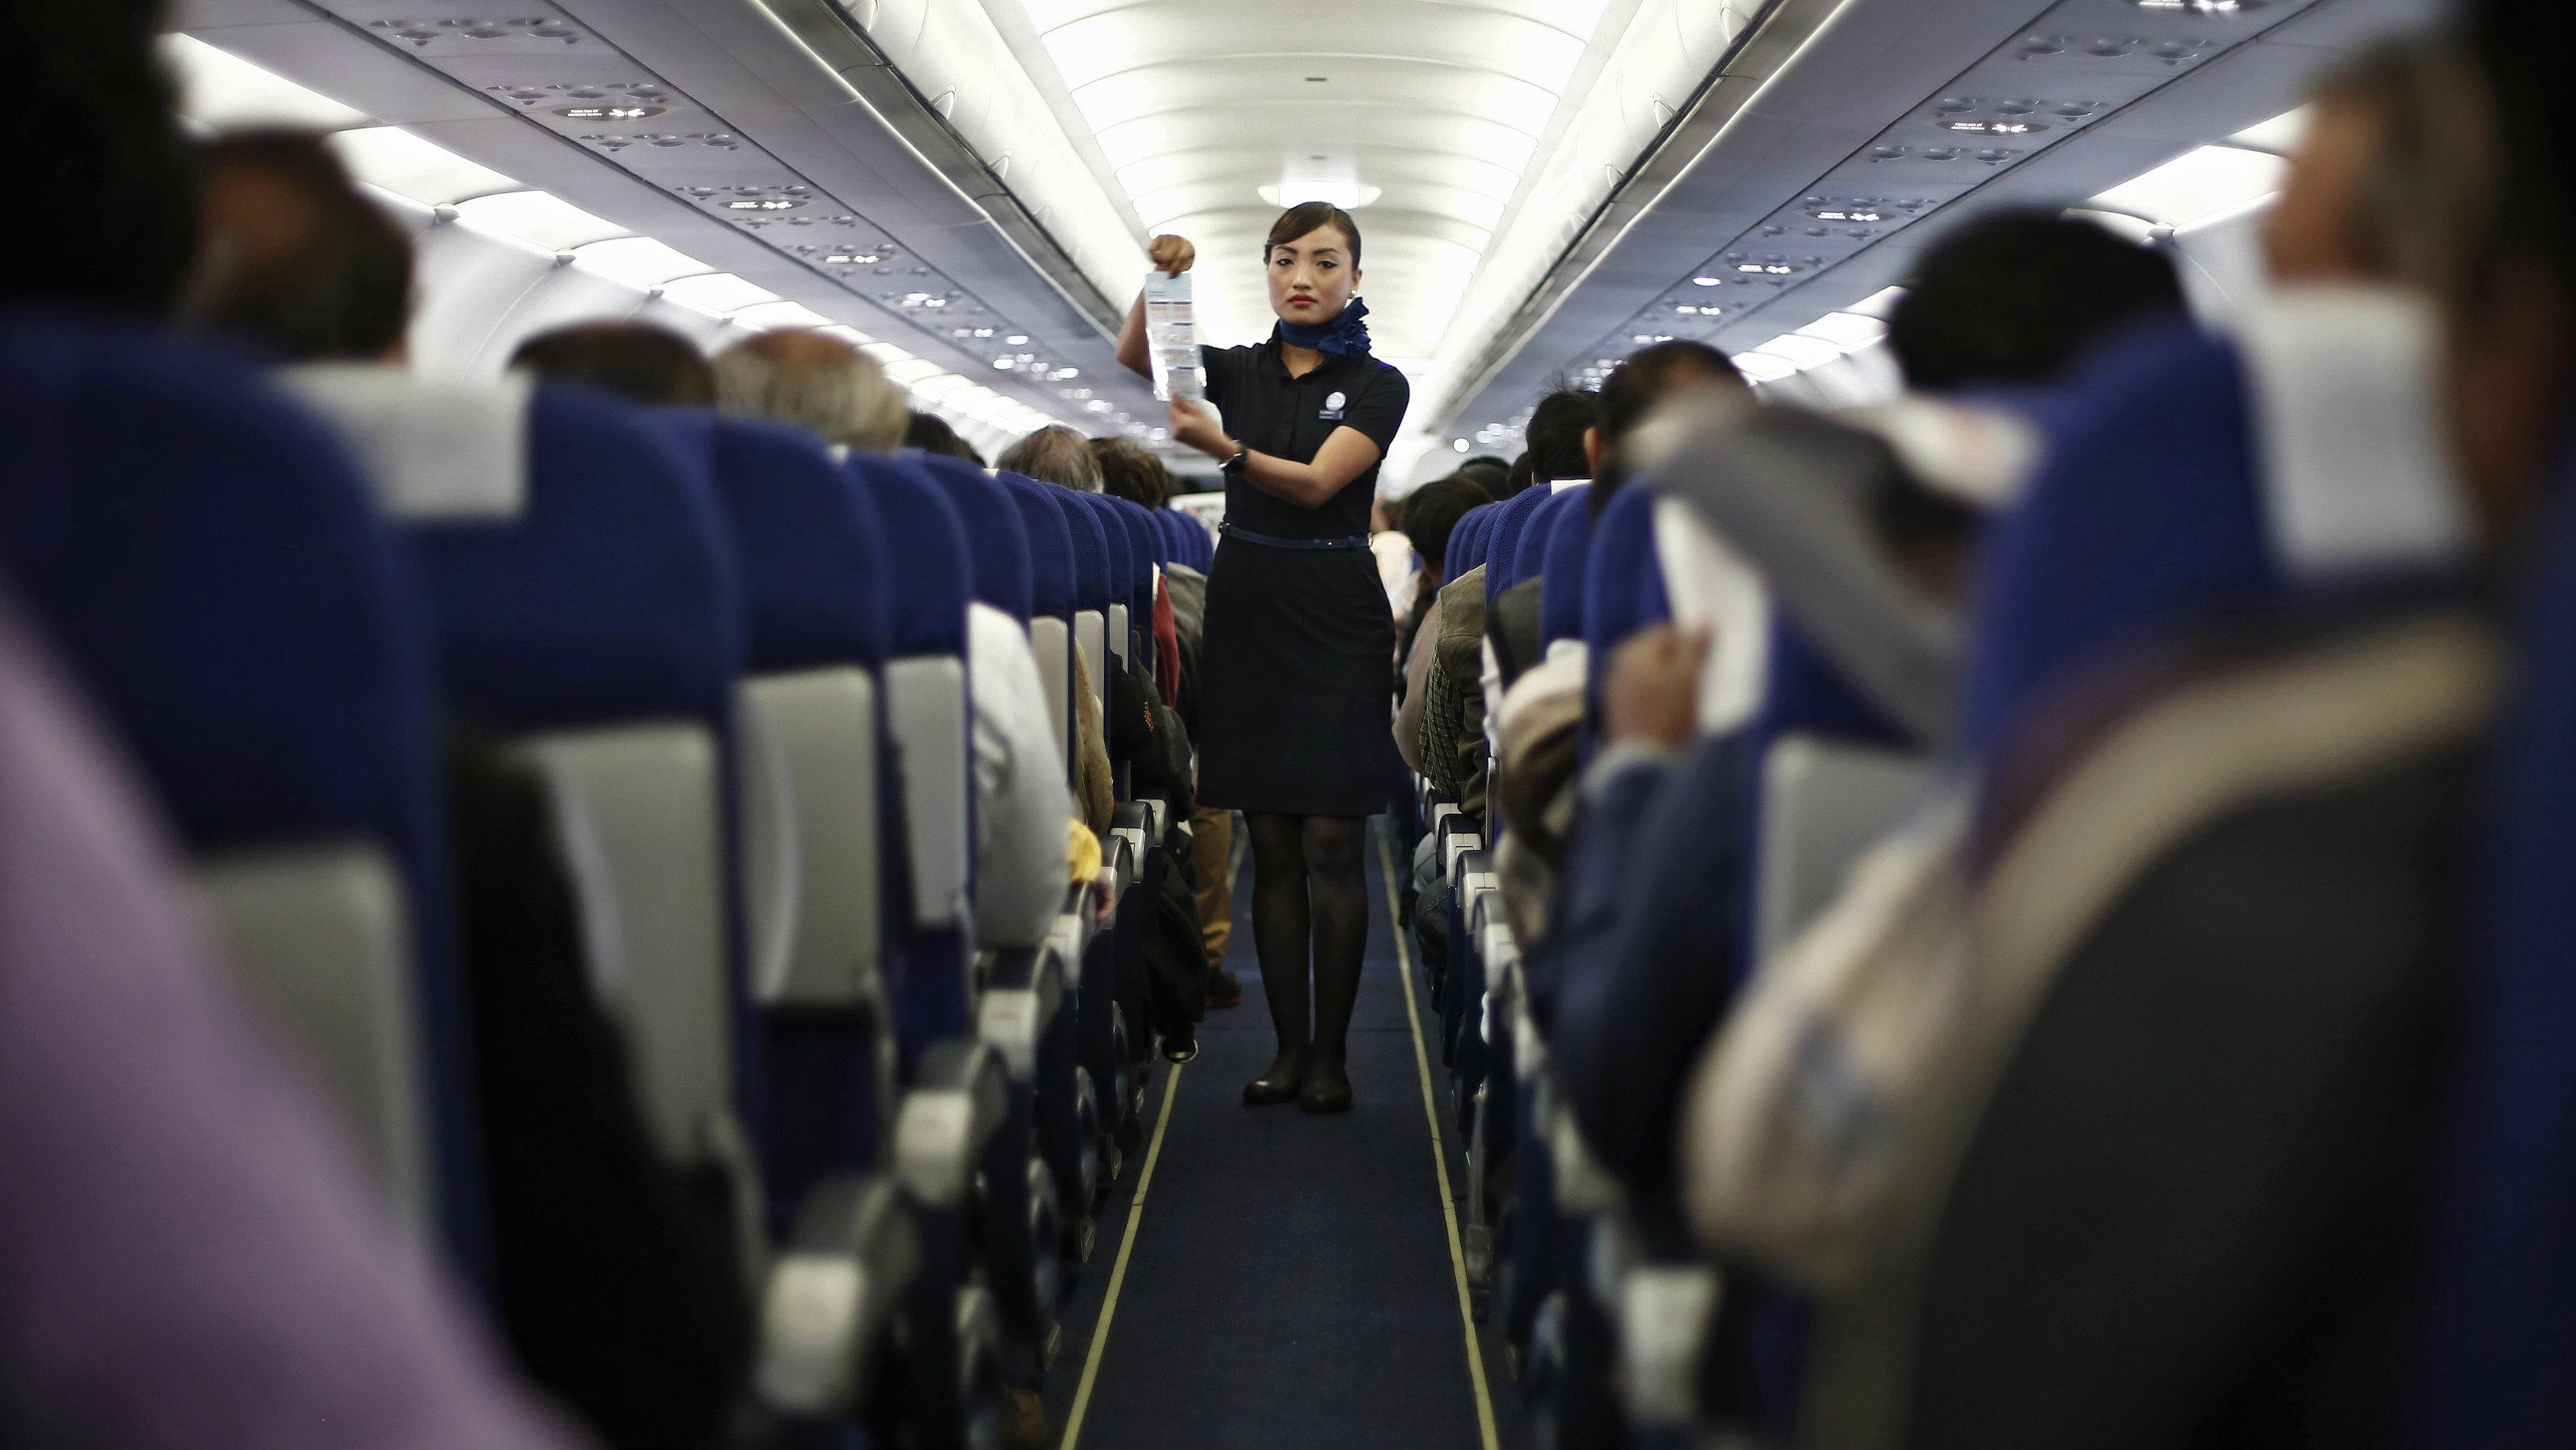 Flight attendant in the aisle